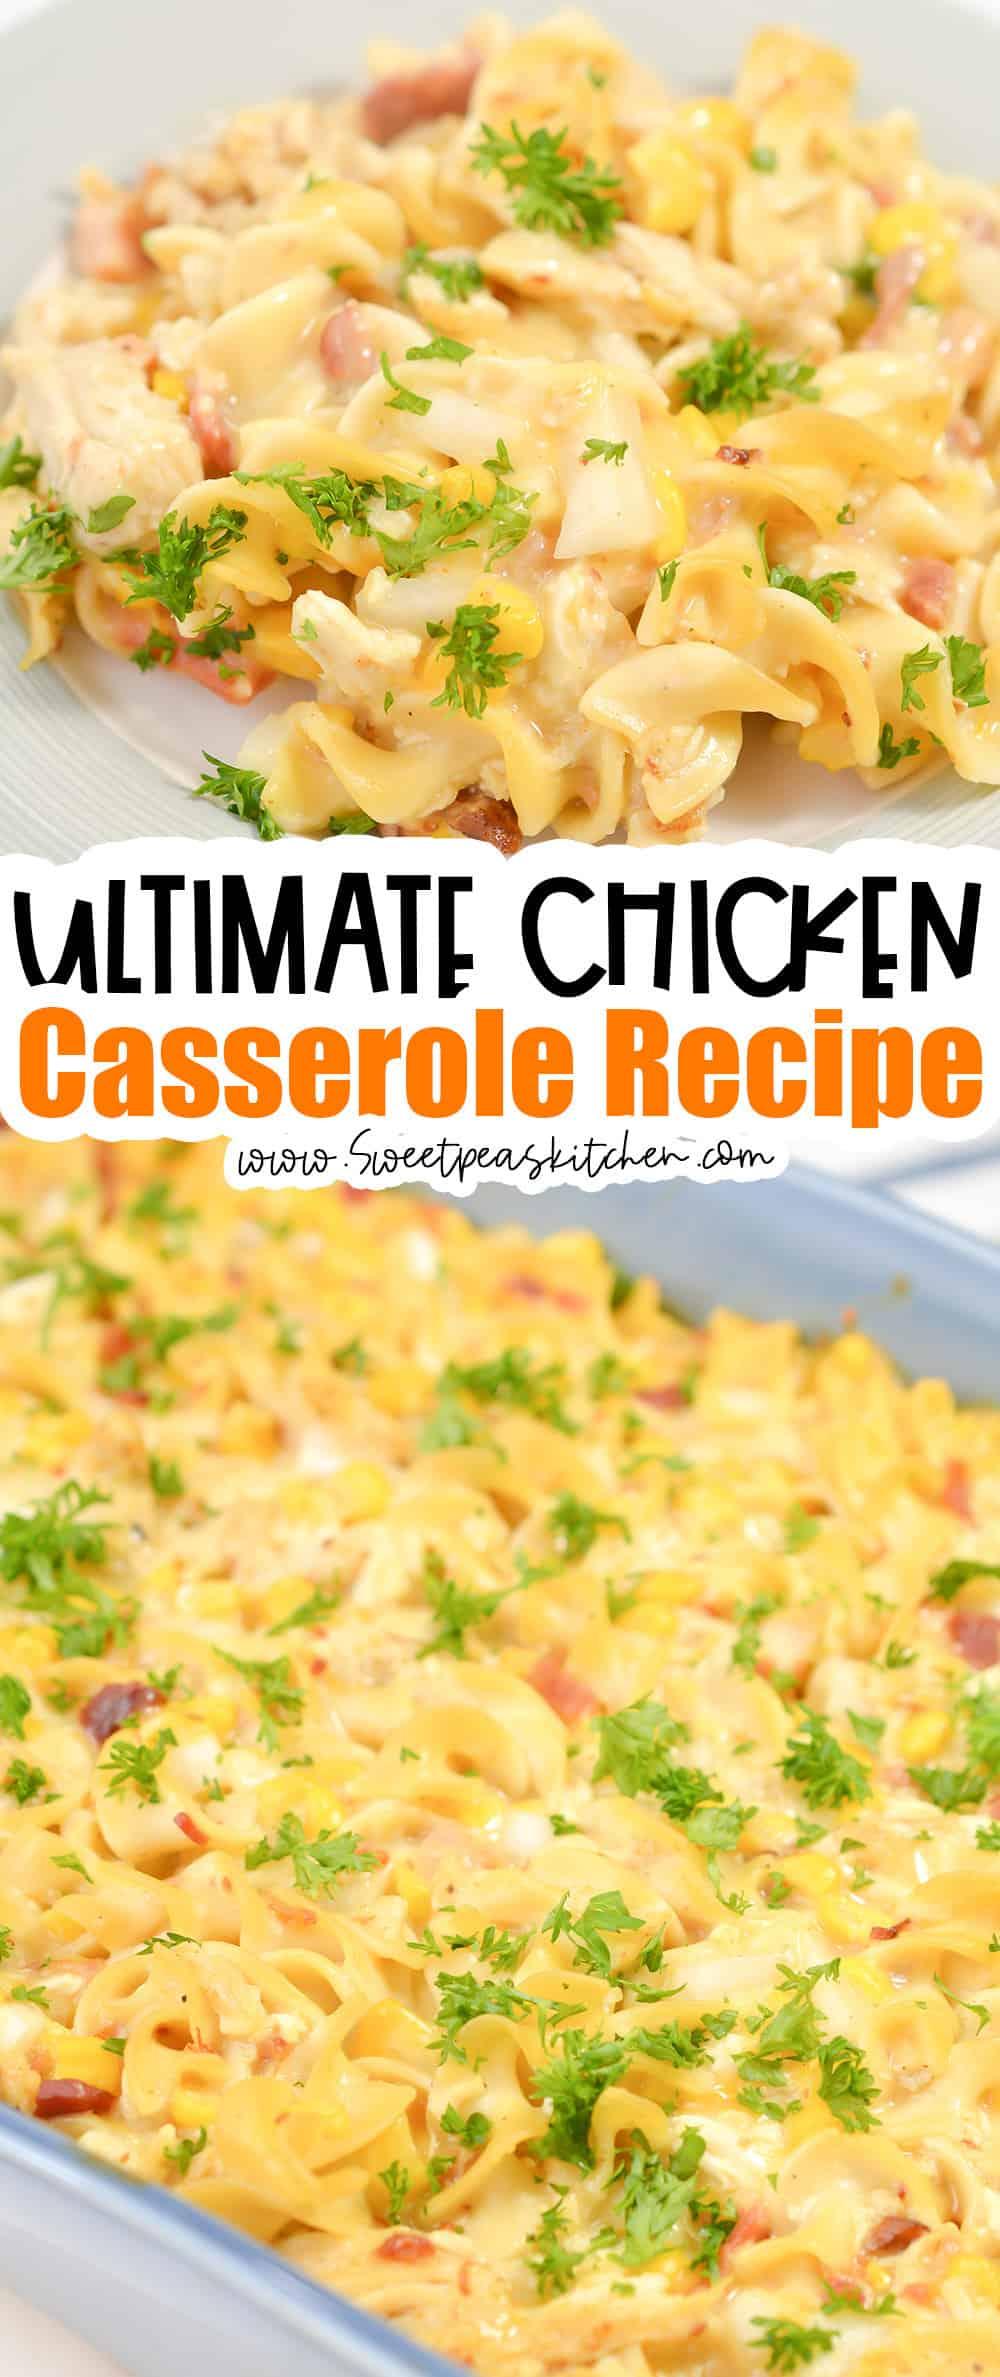 Ultimate Chicken Casserole